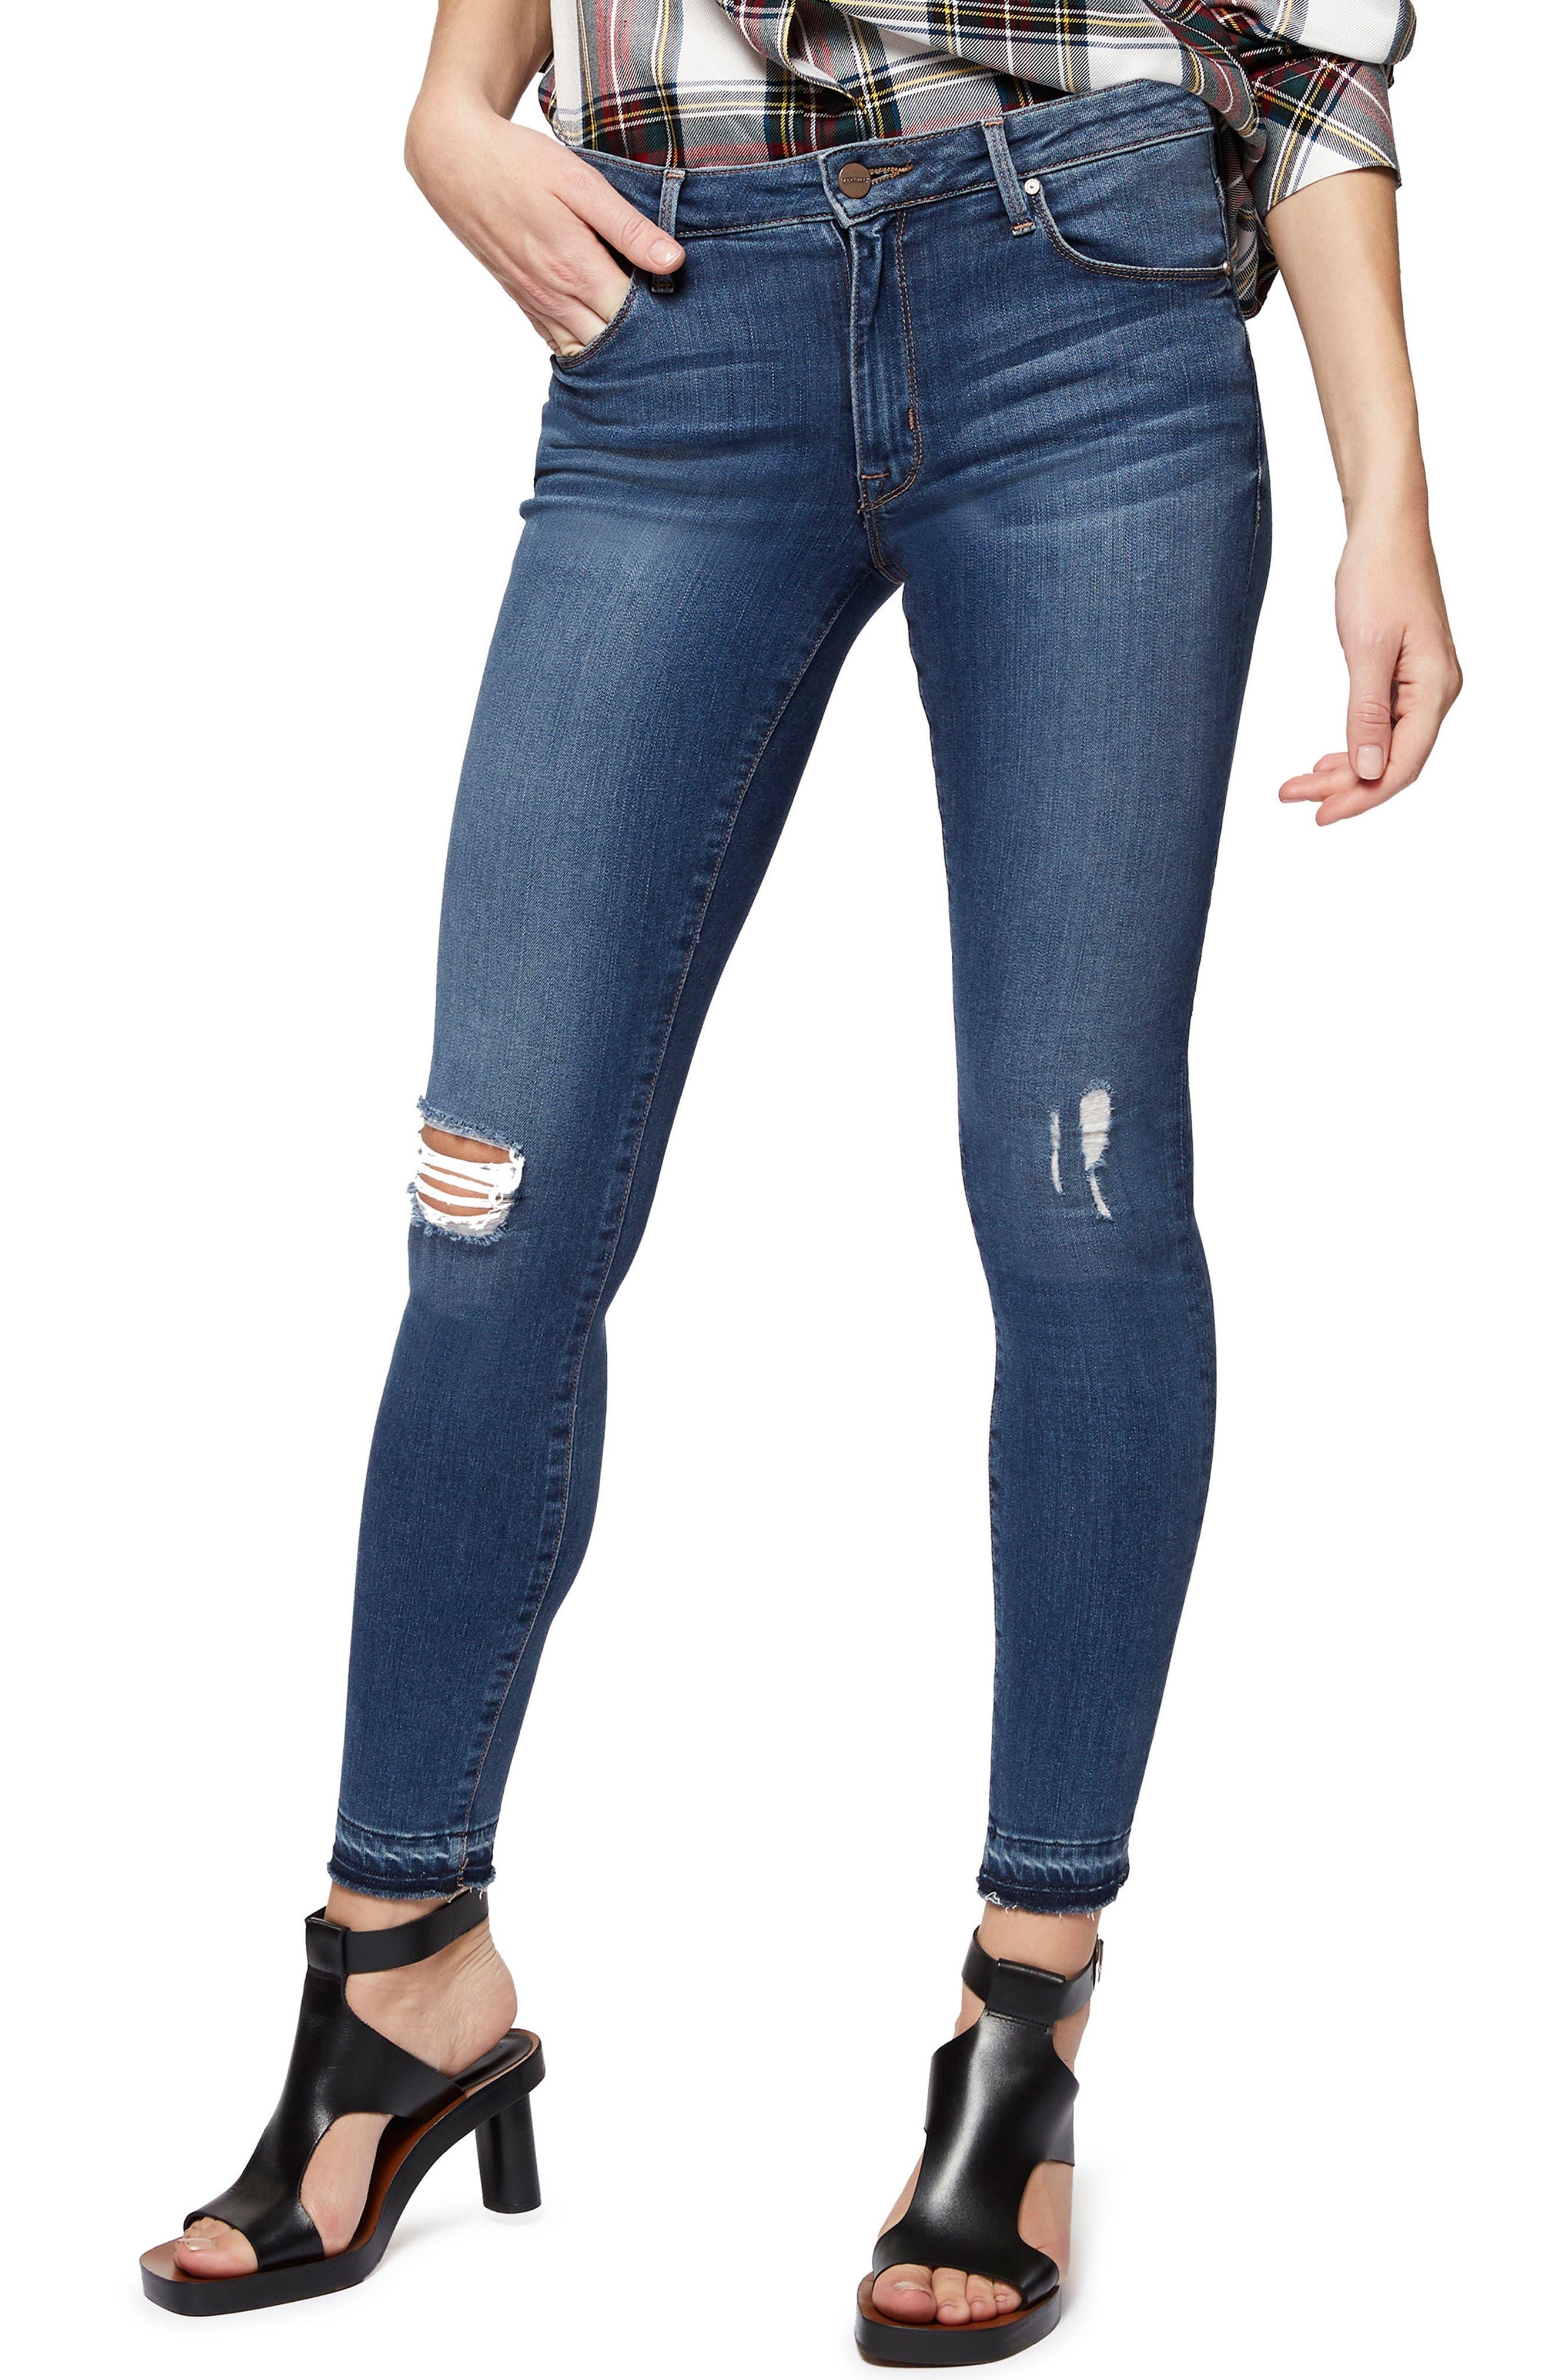 Robbie High Waist Skinny Jeans,                         Main,                         color, Amanda